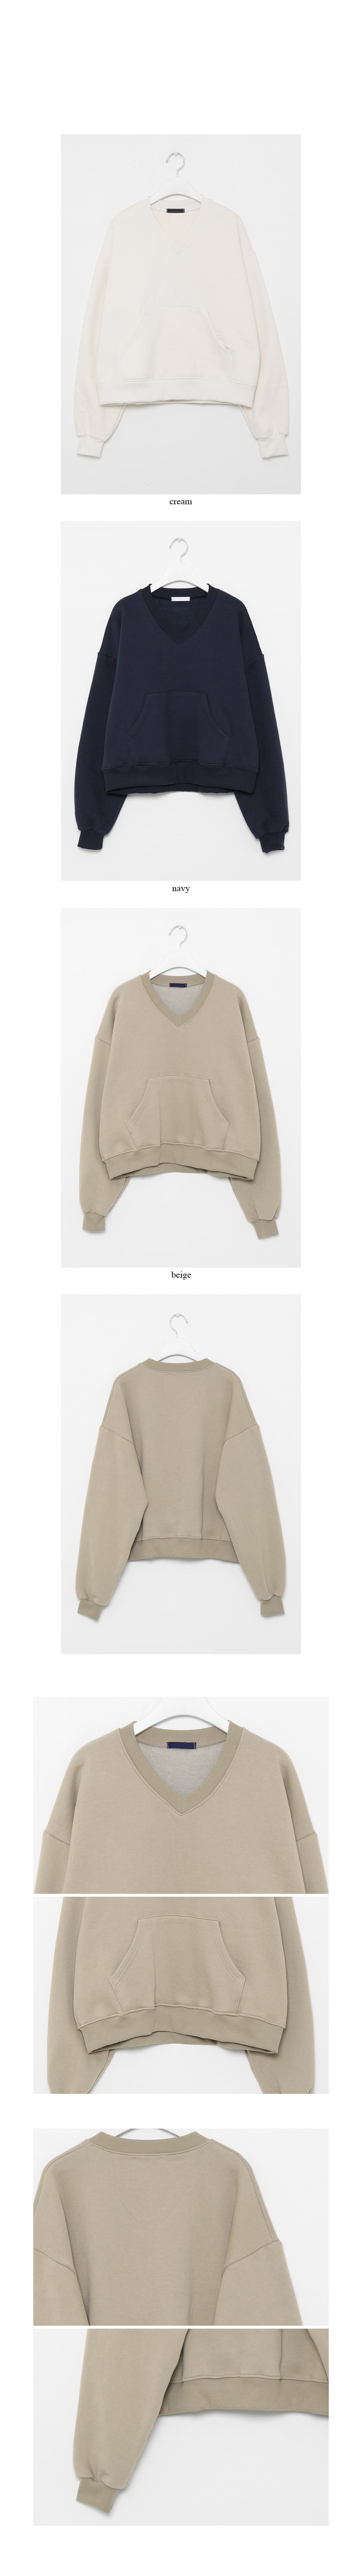 cutie pocket sweatshirts